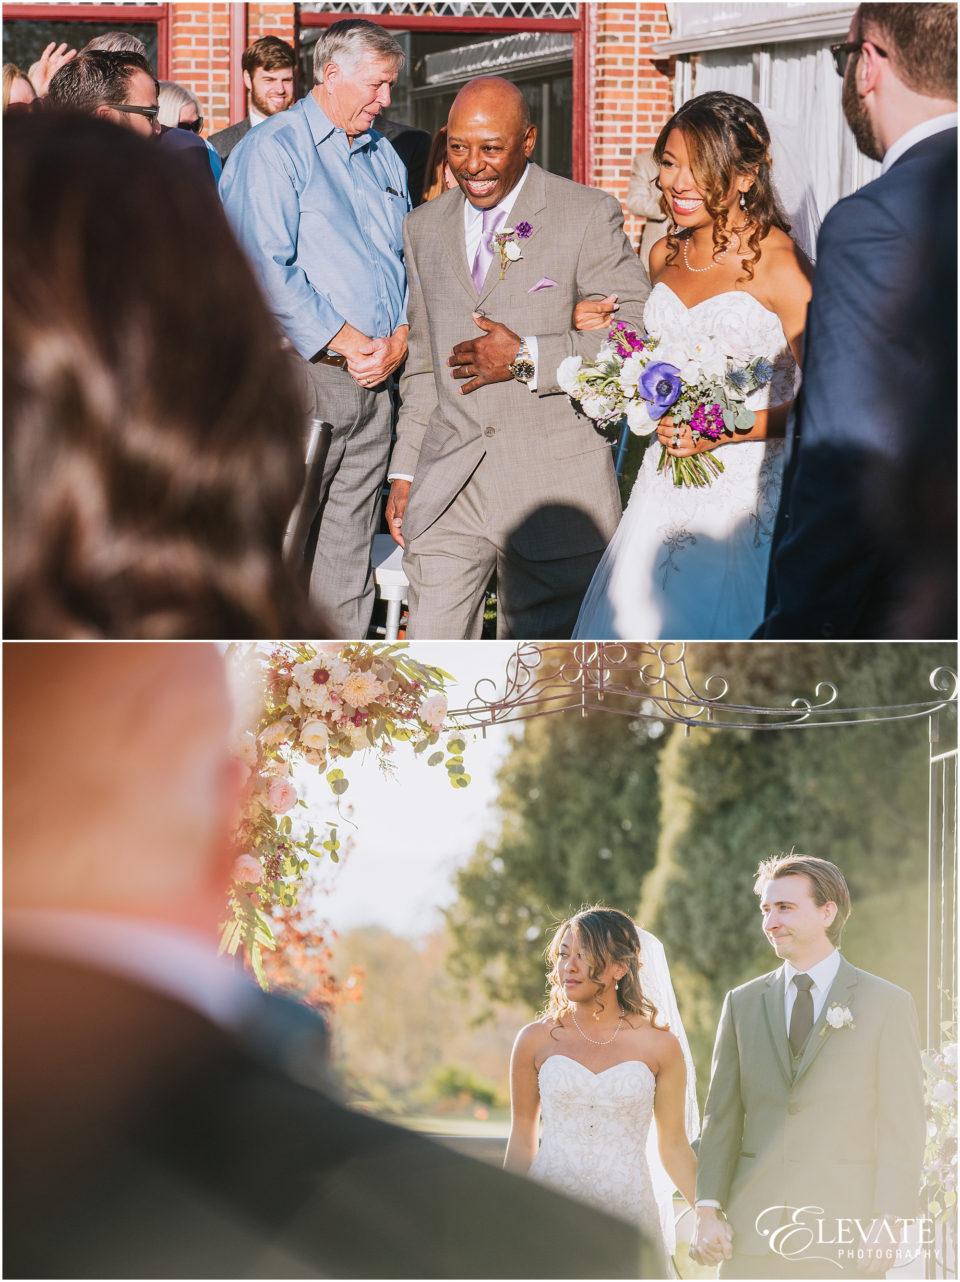 wellshire-event-center-wedding-photos-14